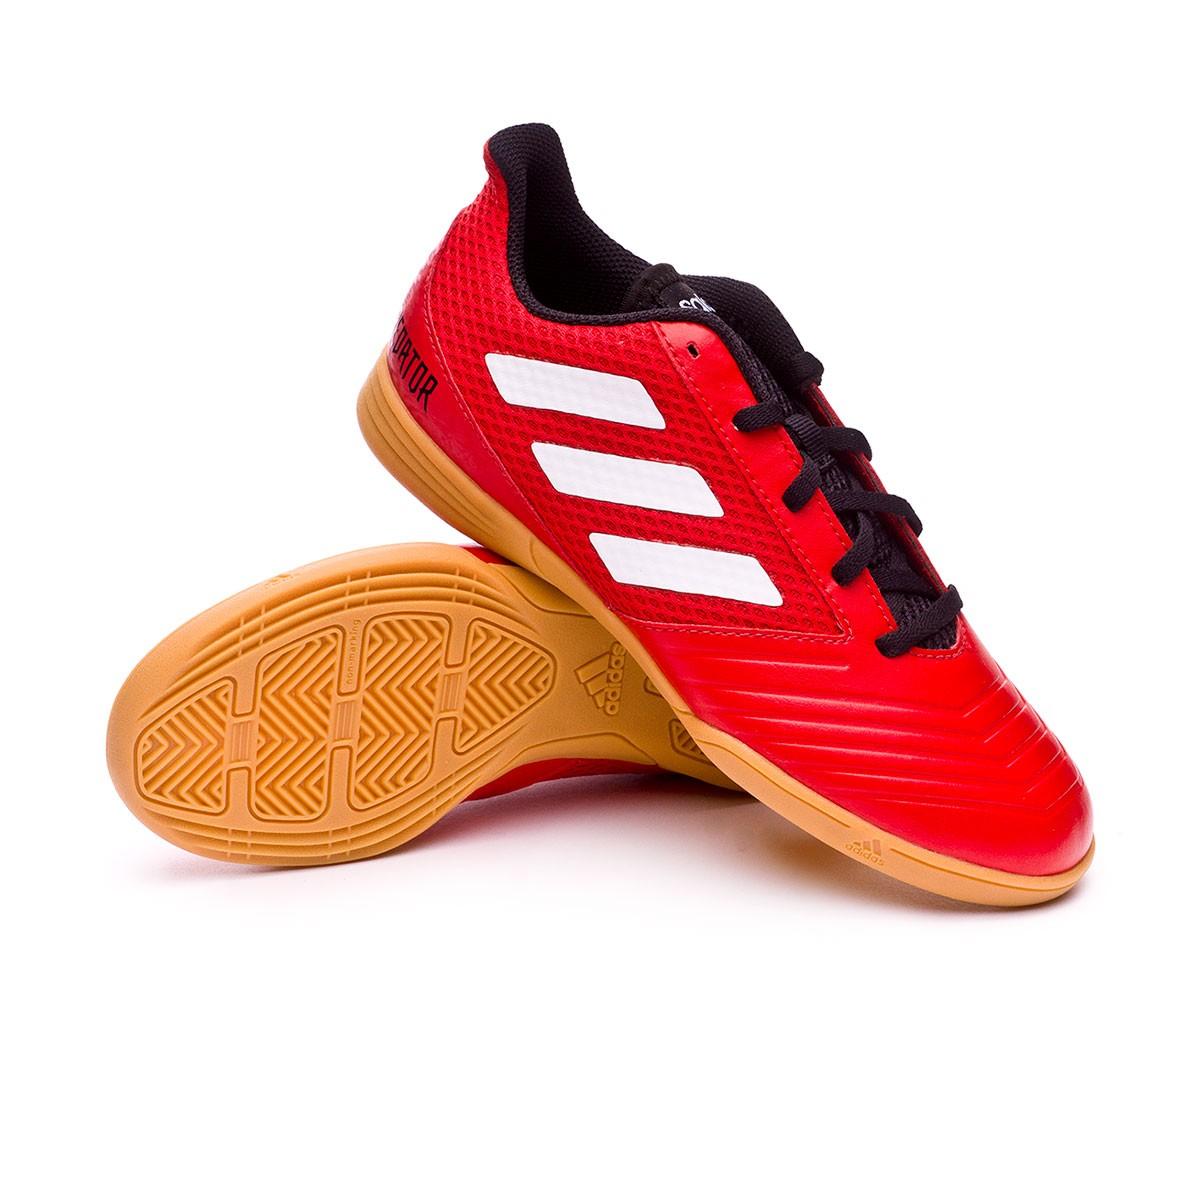 d31b72fbfab5c Zapatilla adidas Predator Tango 18.4 Sala Niño Red-White - Tienda de fútbol  Fútbol Emotion